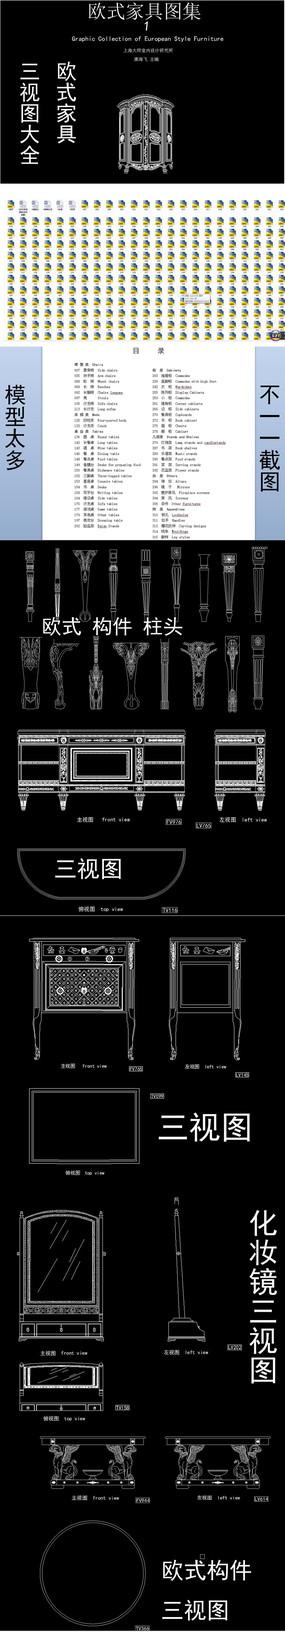 CAD欧式家具图集三视图设计